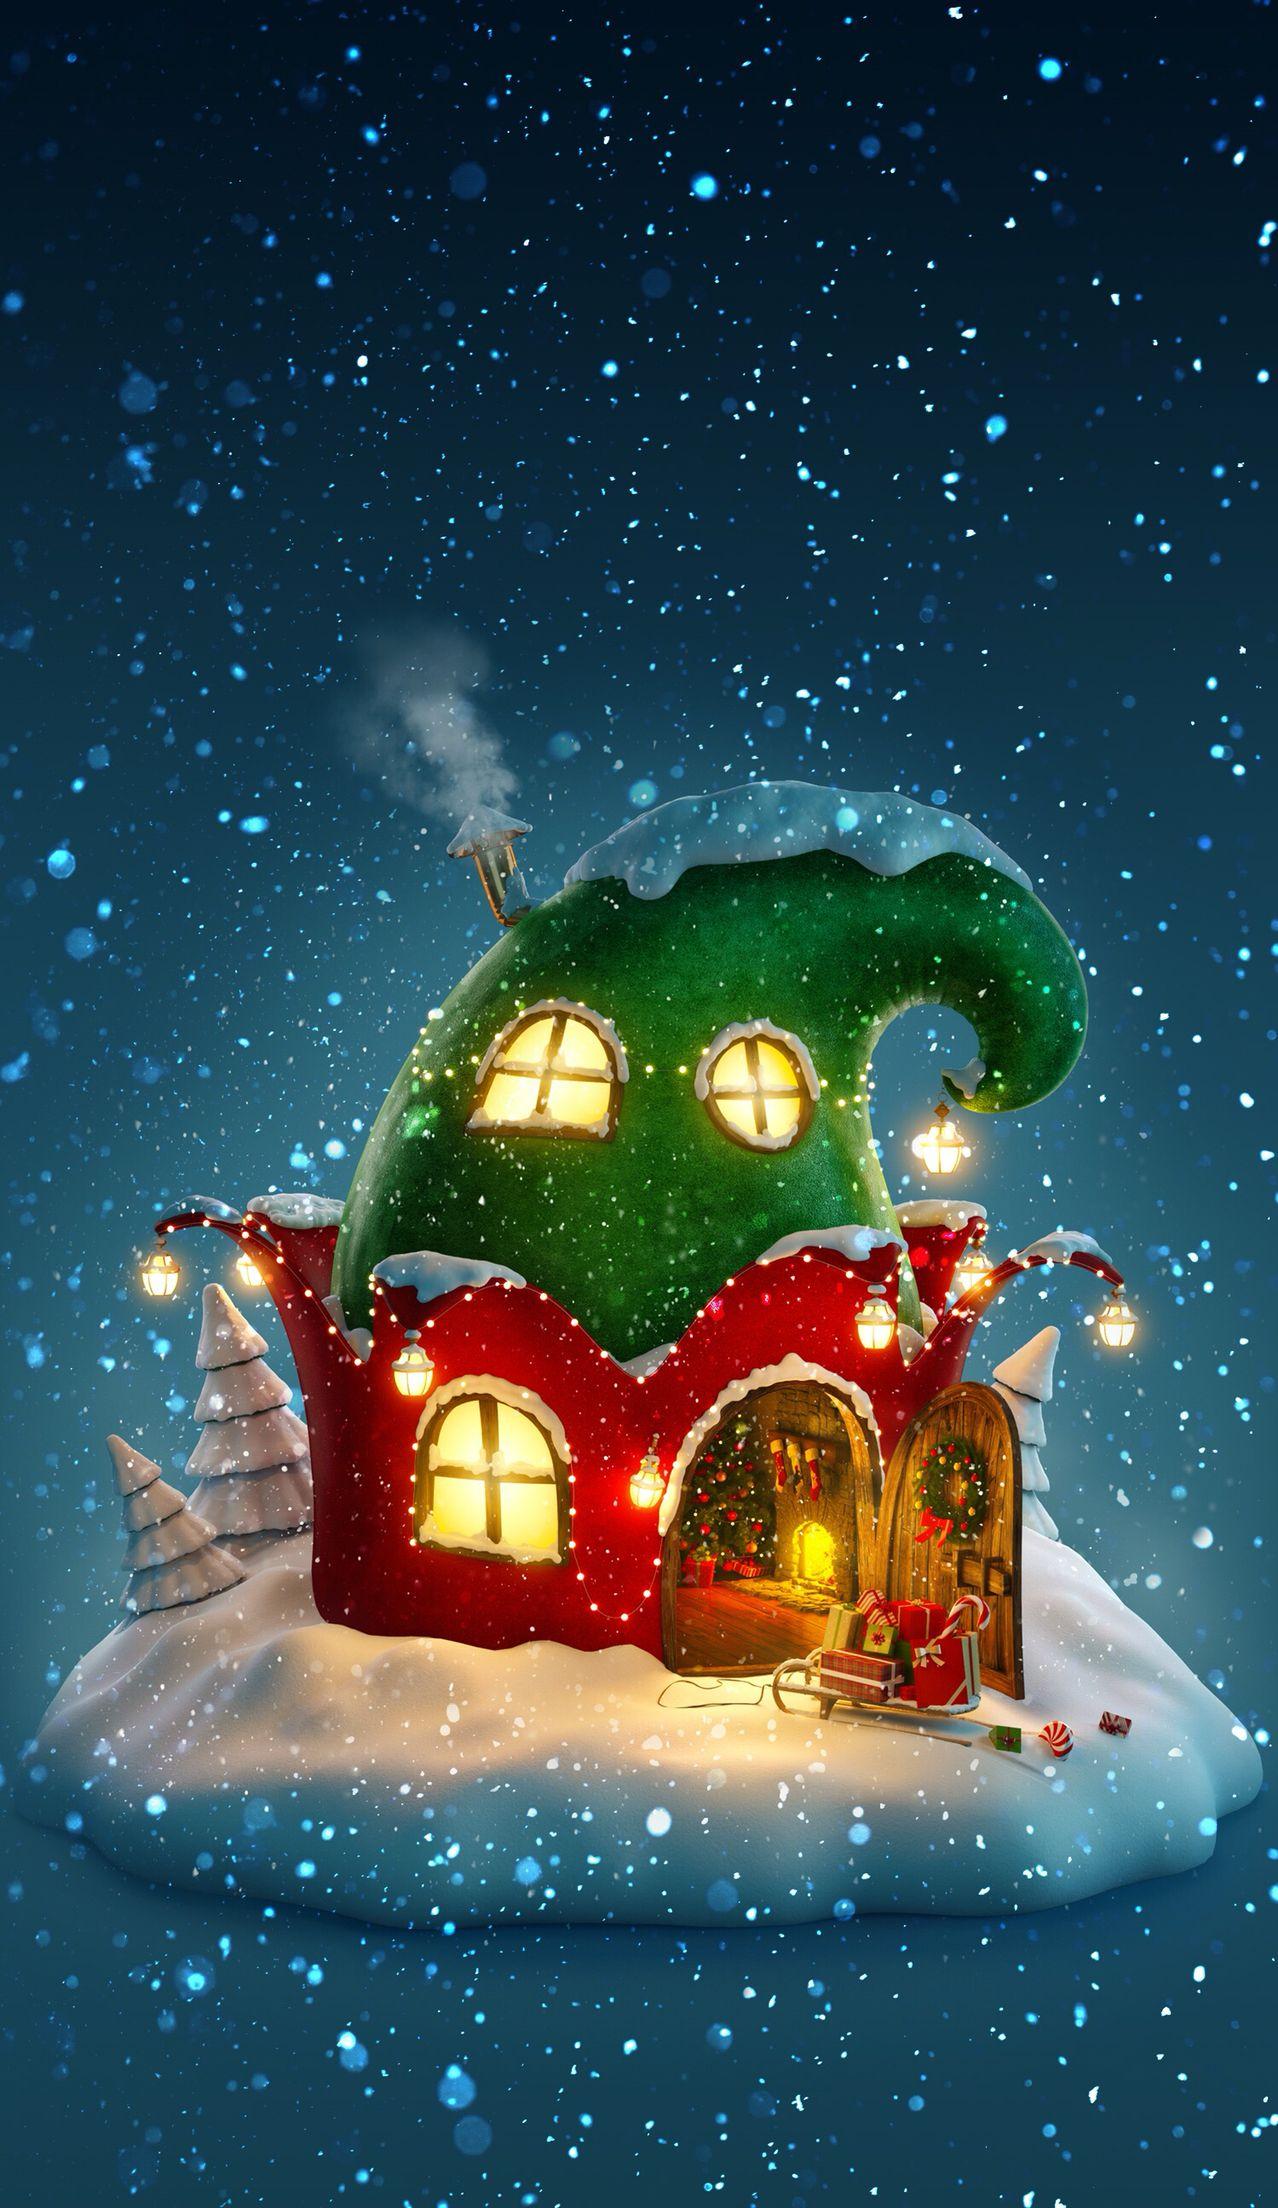 Elf House Christmas Art Christmas Illustration Christmas Wallpaper